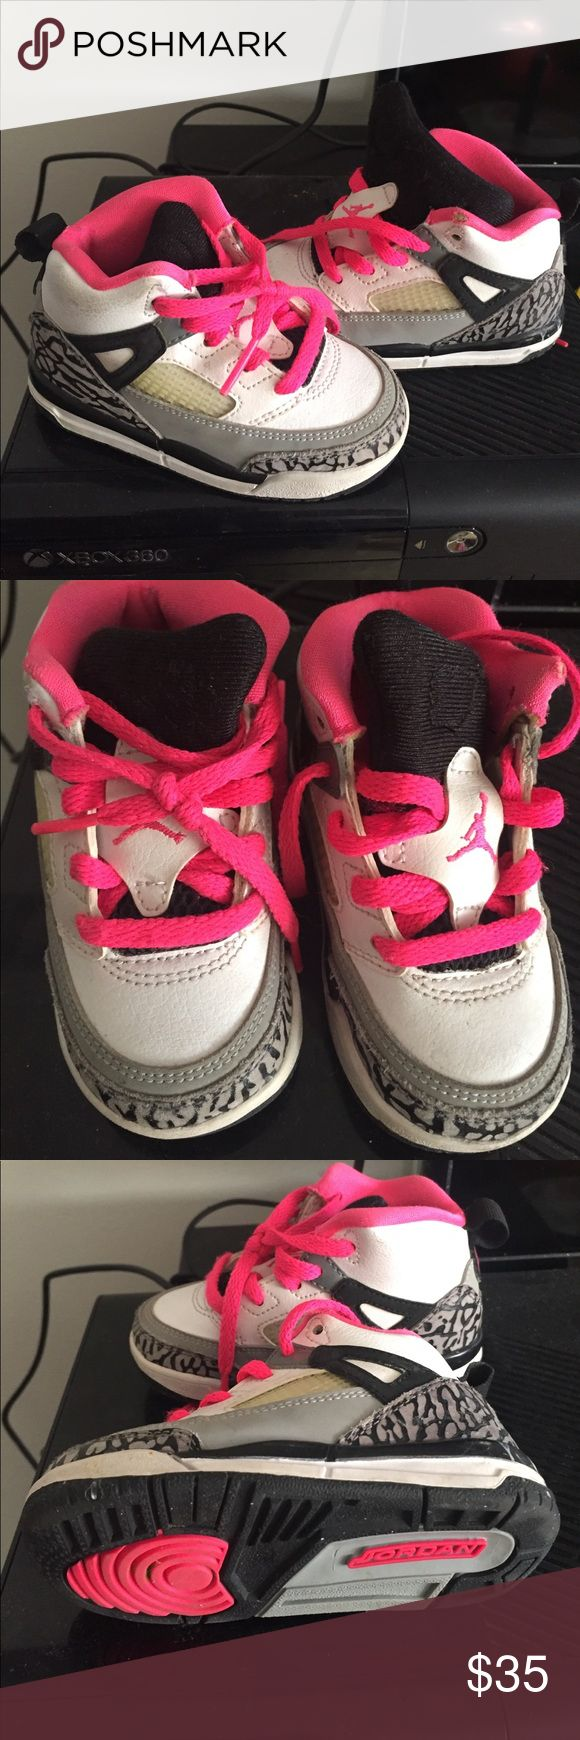 Nike Jordan Spizike toddler 6c used Good shape Nike toddler Jordan Spizike 6c Jordan Shoes Sneakers